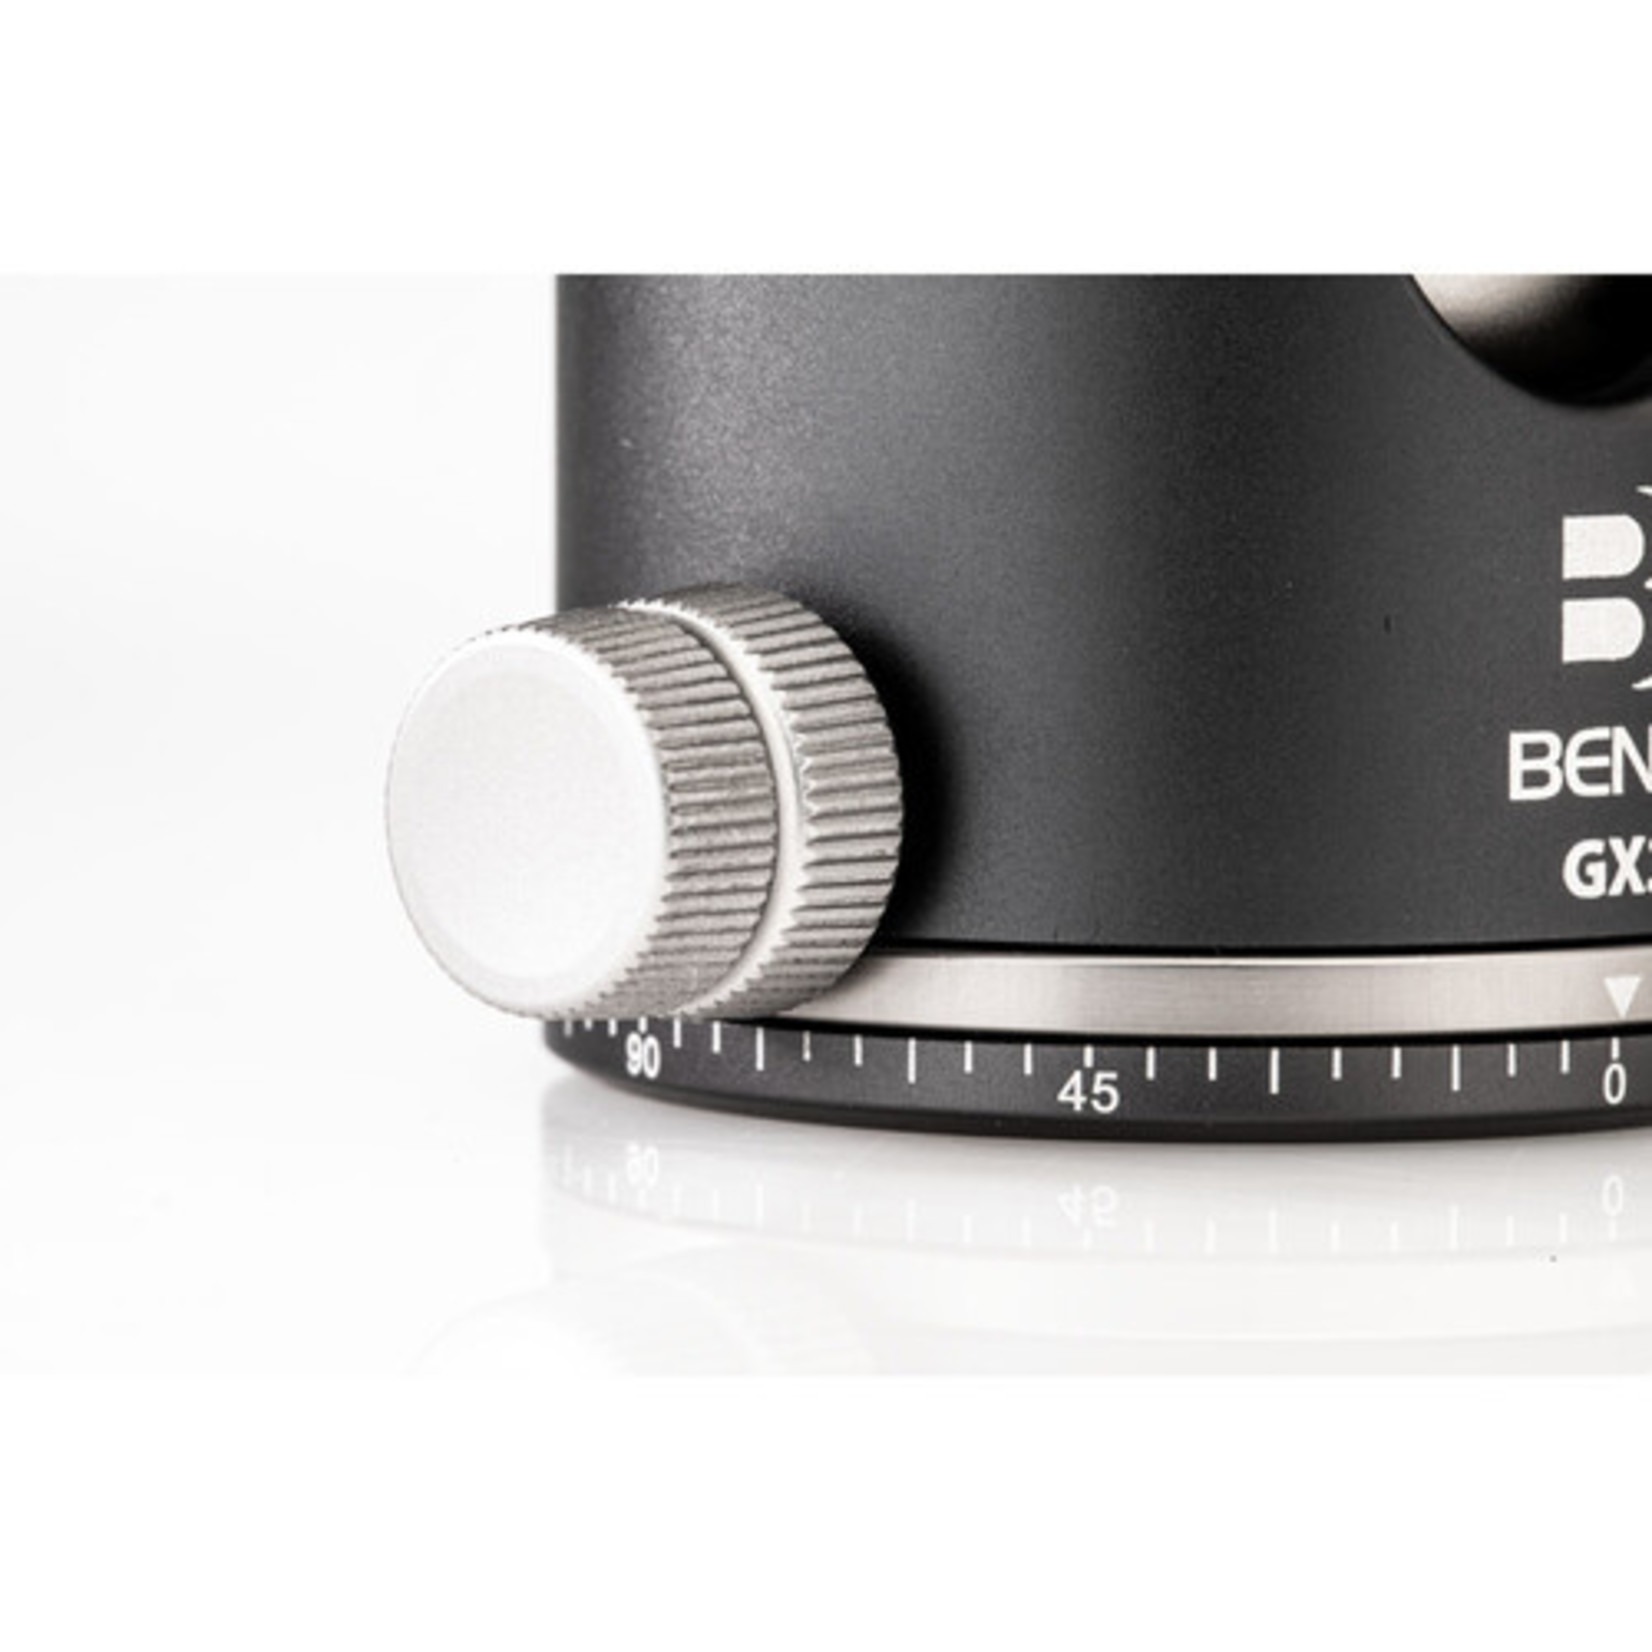 Benro Benro GX35 Two Series Arca-Type Low Profile Aluminum Ball Head